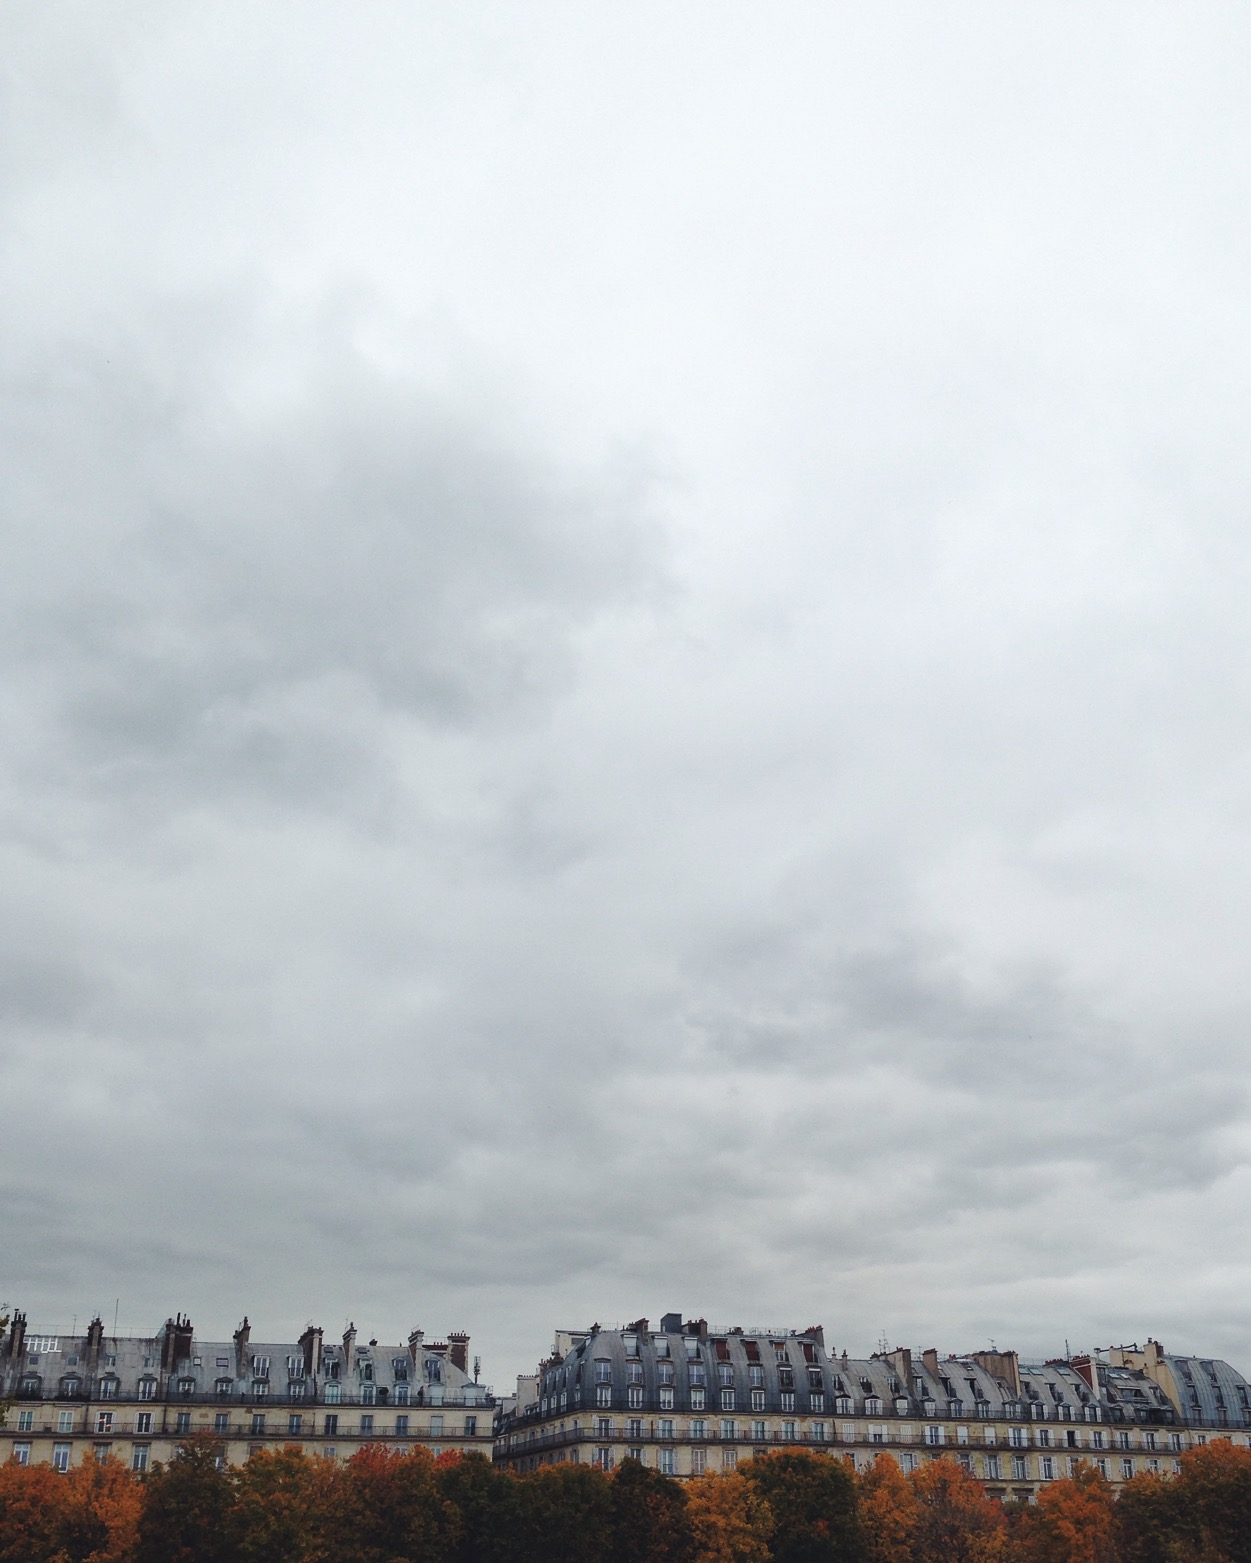 Buildings on Rue de Rivoli, seen from the Jardins des Tuileries